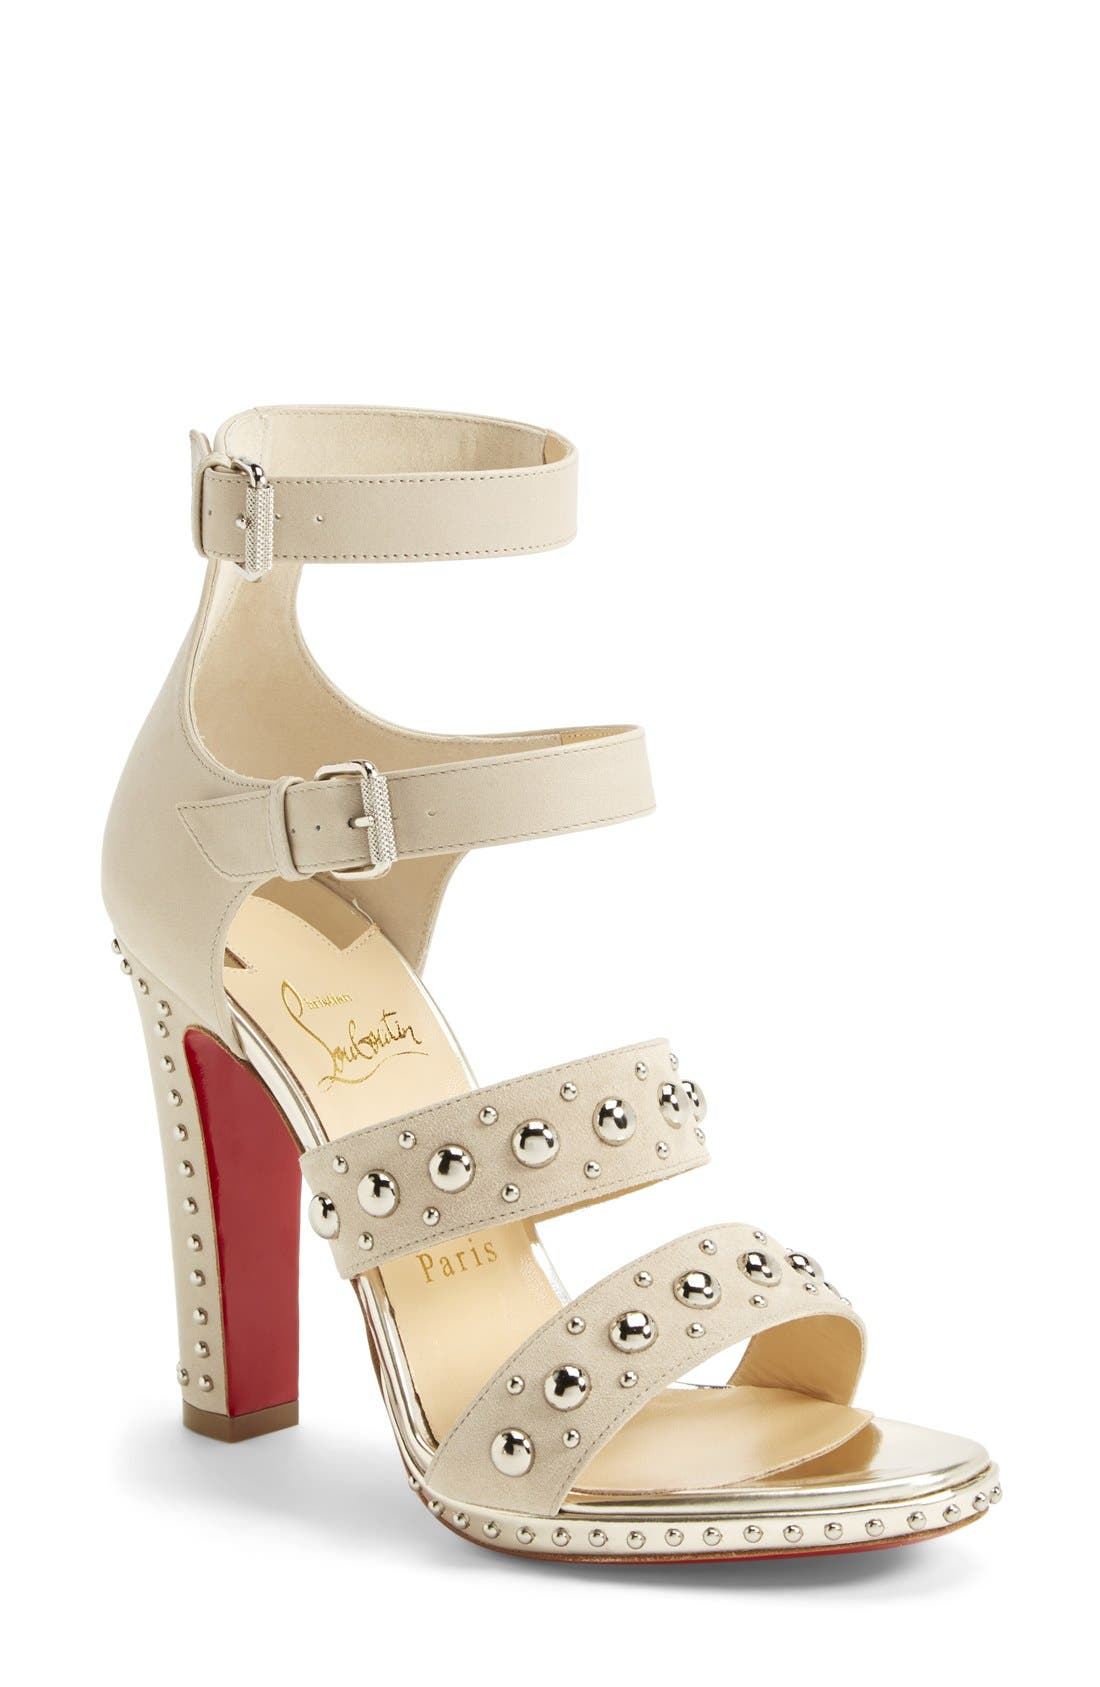 Main Image - Christian Louboutin Studded Sandal